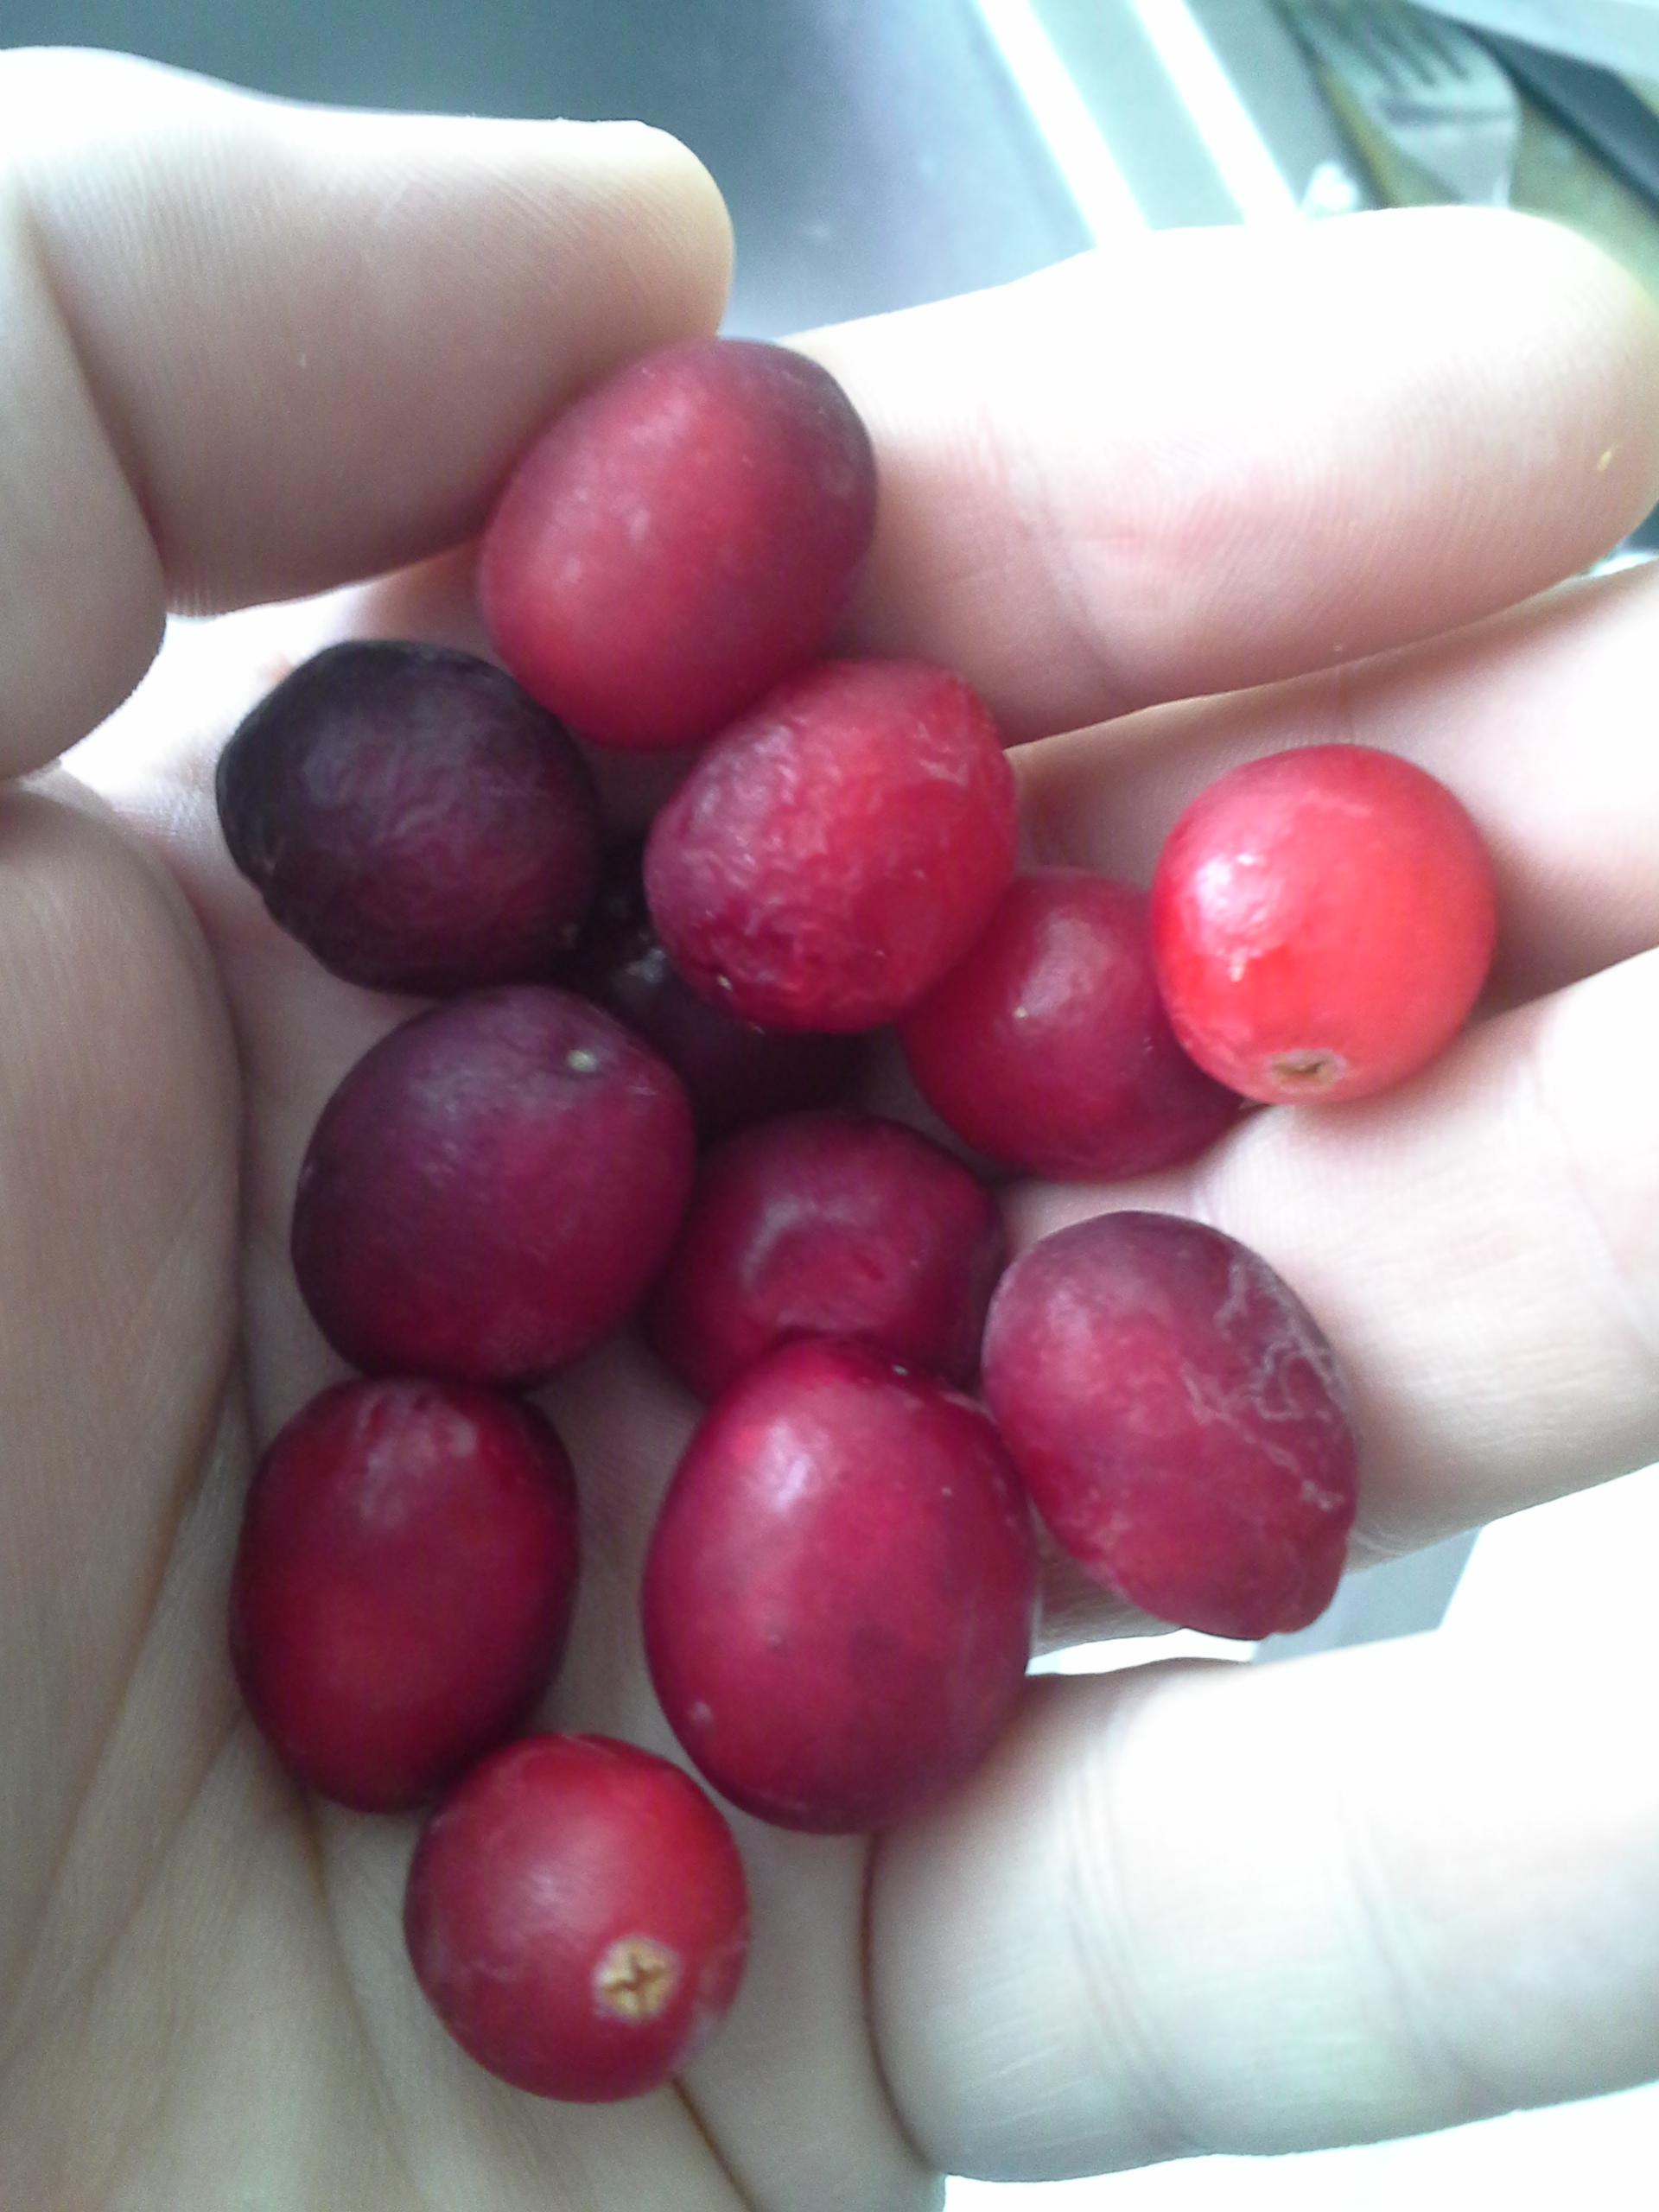 Breakfast: 10:30 a.m. | 12 cranberries